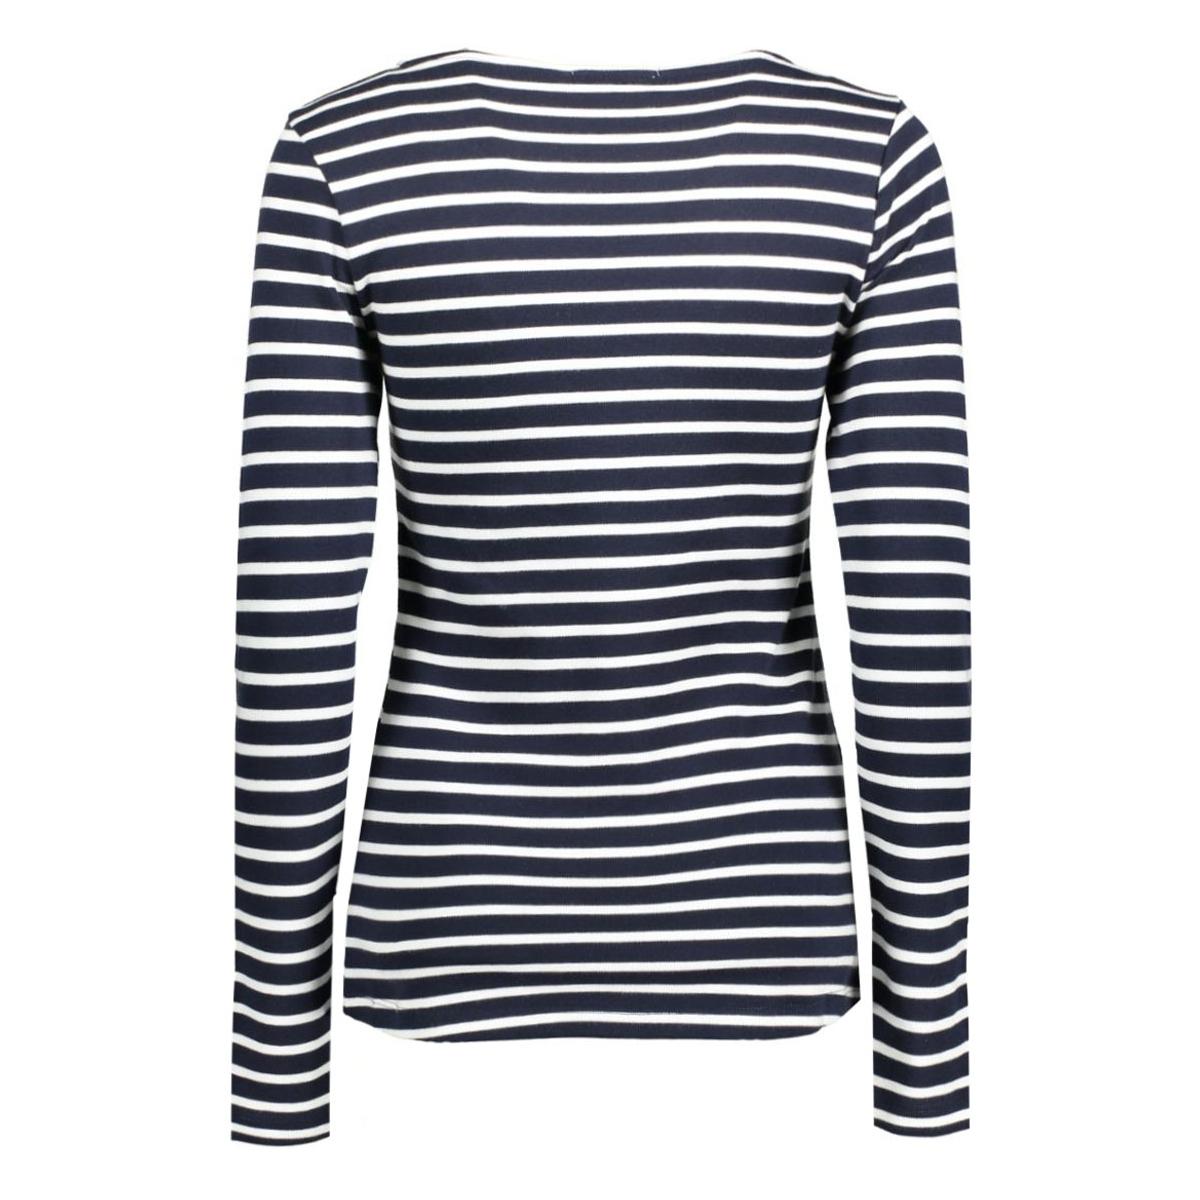 1035268.09.71 tom tailor t-shirt 6593